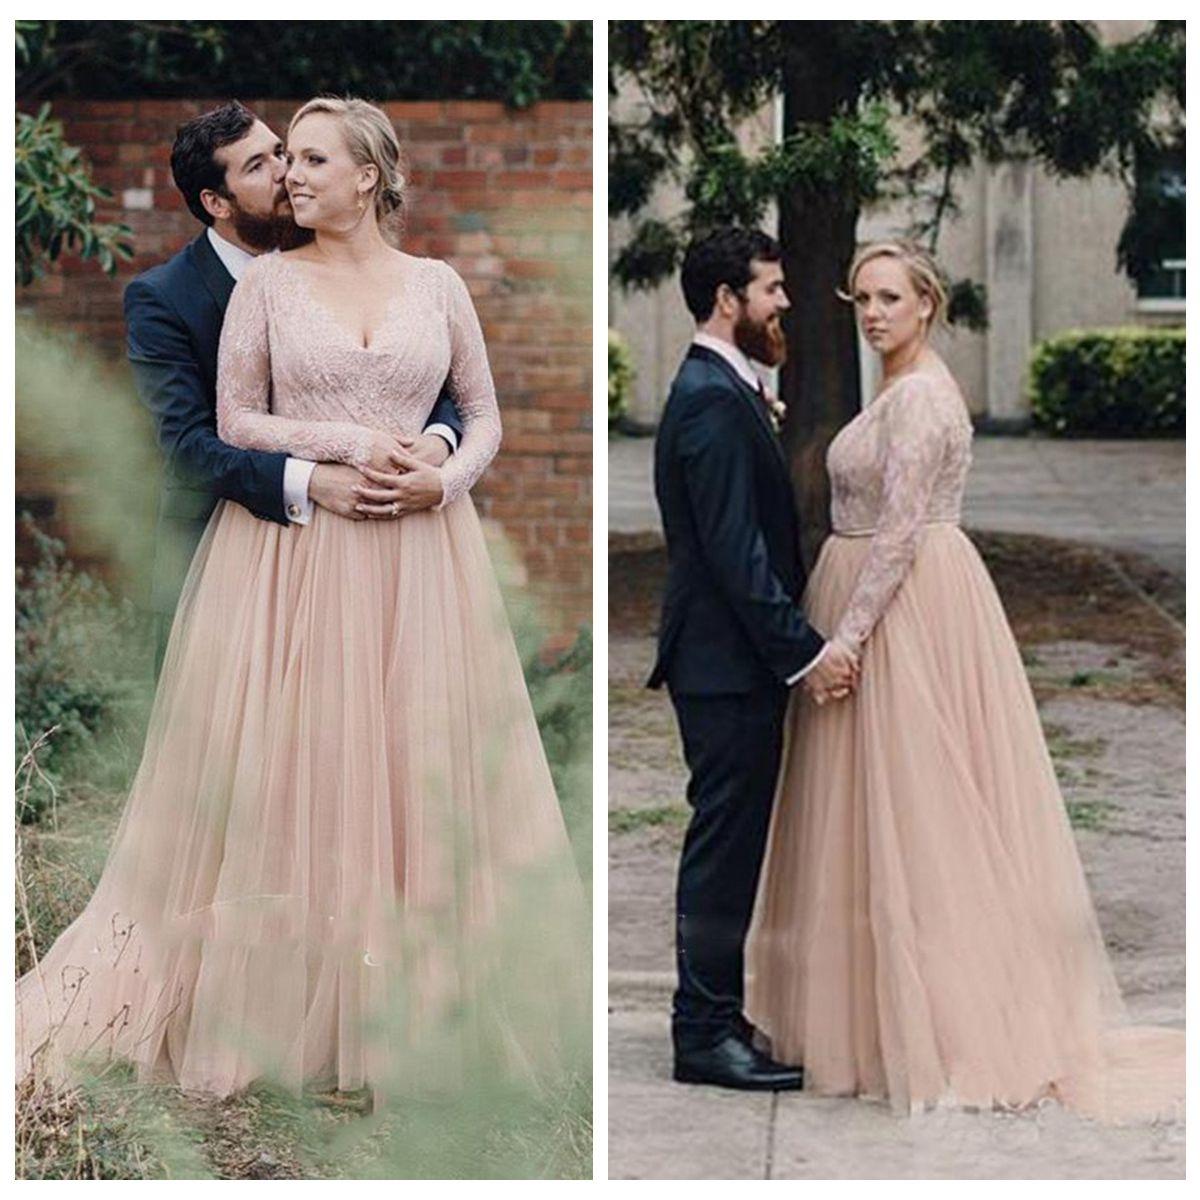 Blush Pink Wedding Dresses 2019 Plus Size A Line V Neck Long Sleeve  Backless Floor Length Sequins Lace Sashes vestido de novia Bridal Gowns